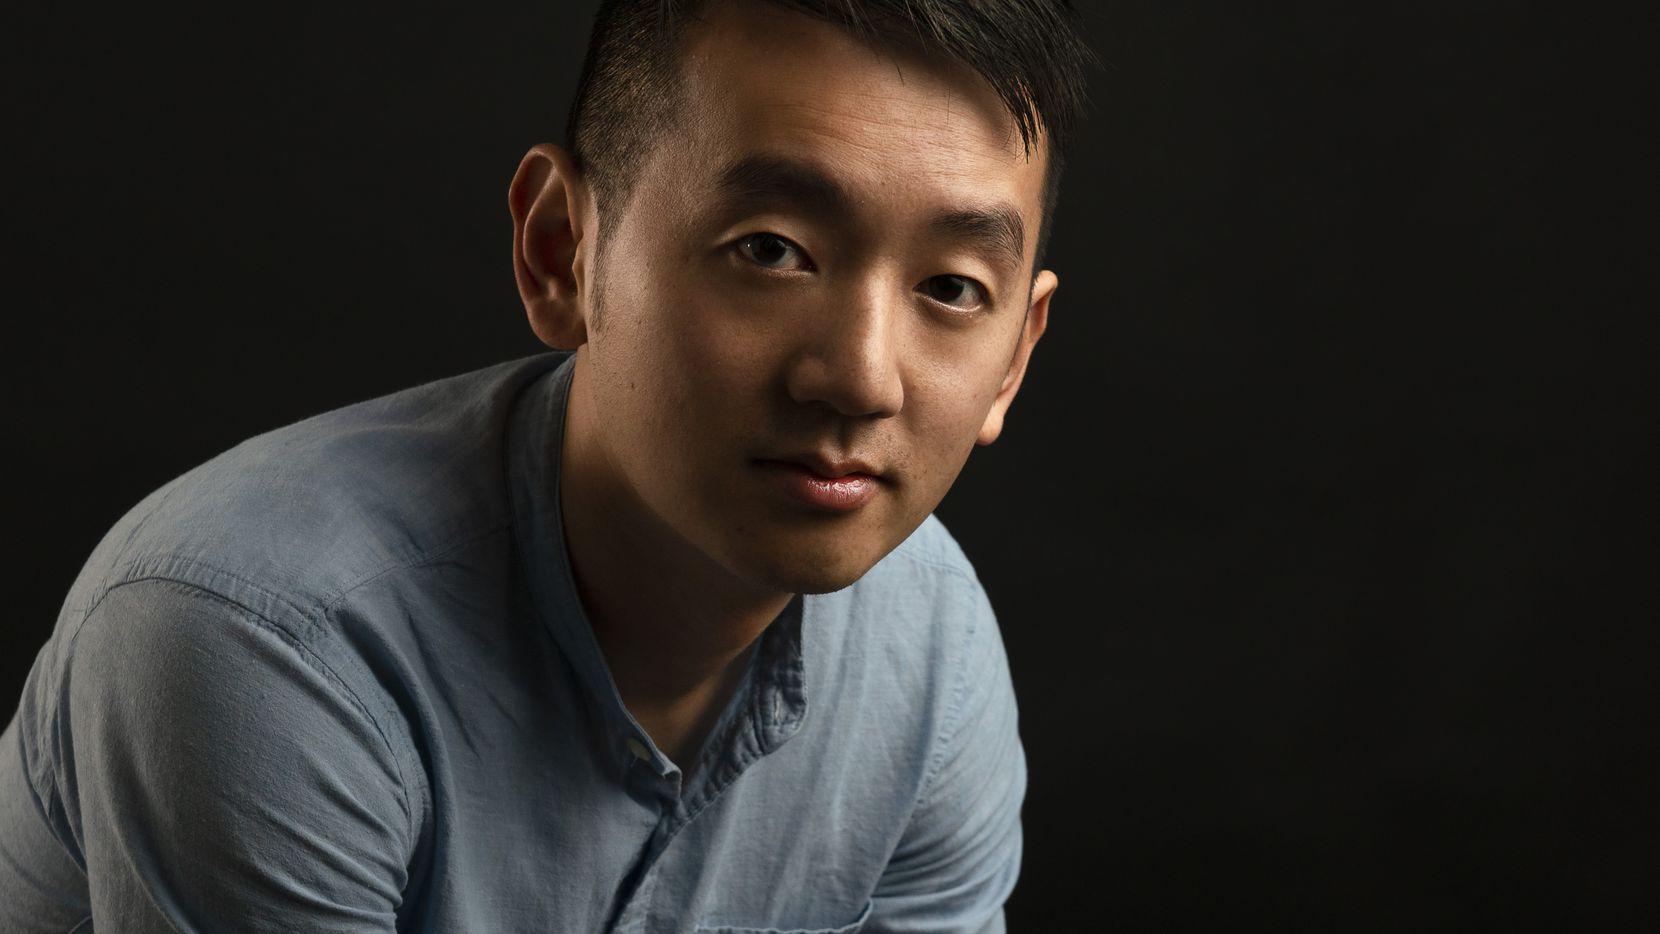 Award-winning writer Simon Han has set his debut novel in Plano, along burgeoning Legacy Drive during the city's boom years.